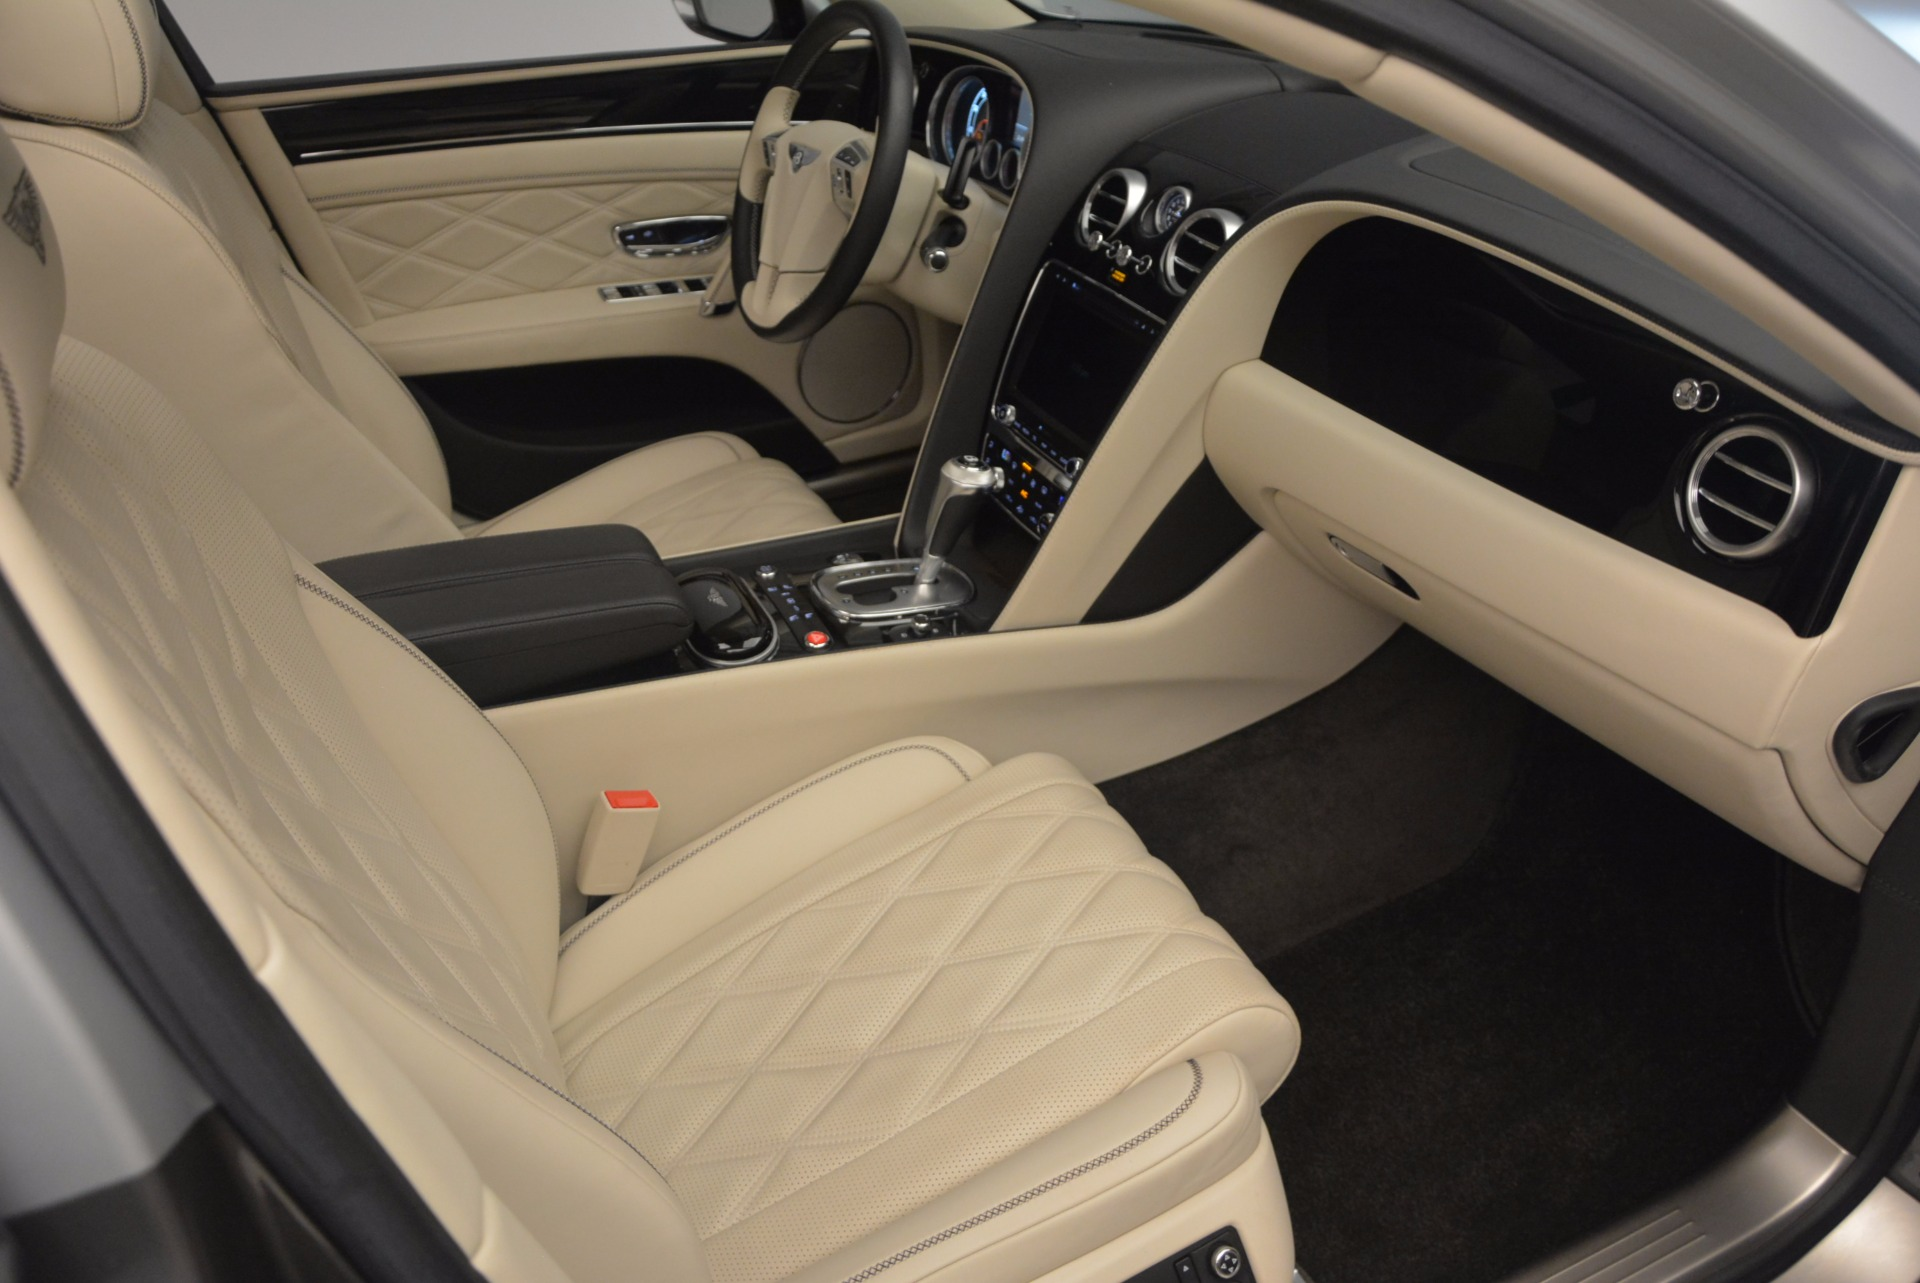 Used 2015 Bentley Flying Spur W12 For Sale In Westport, CT 1582_p41